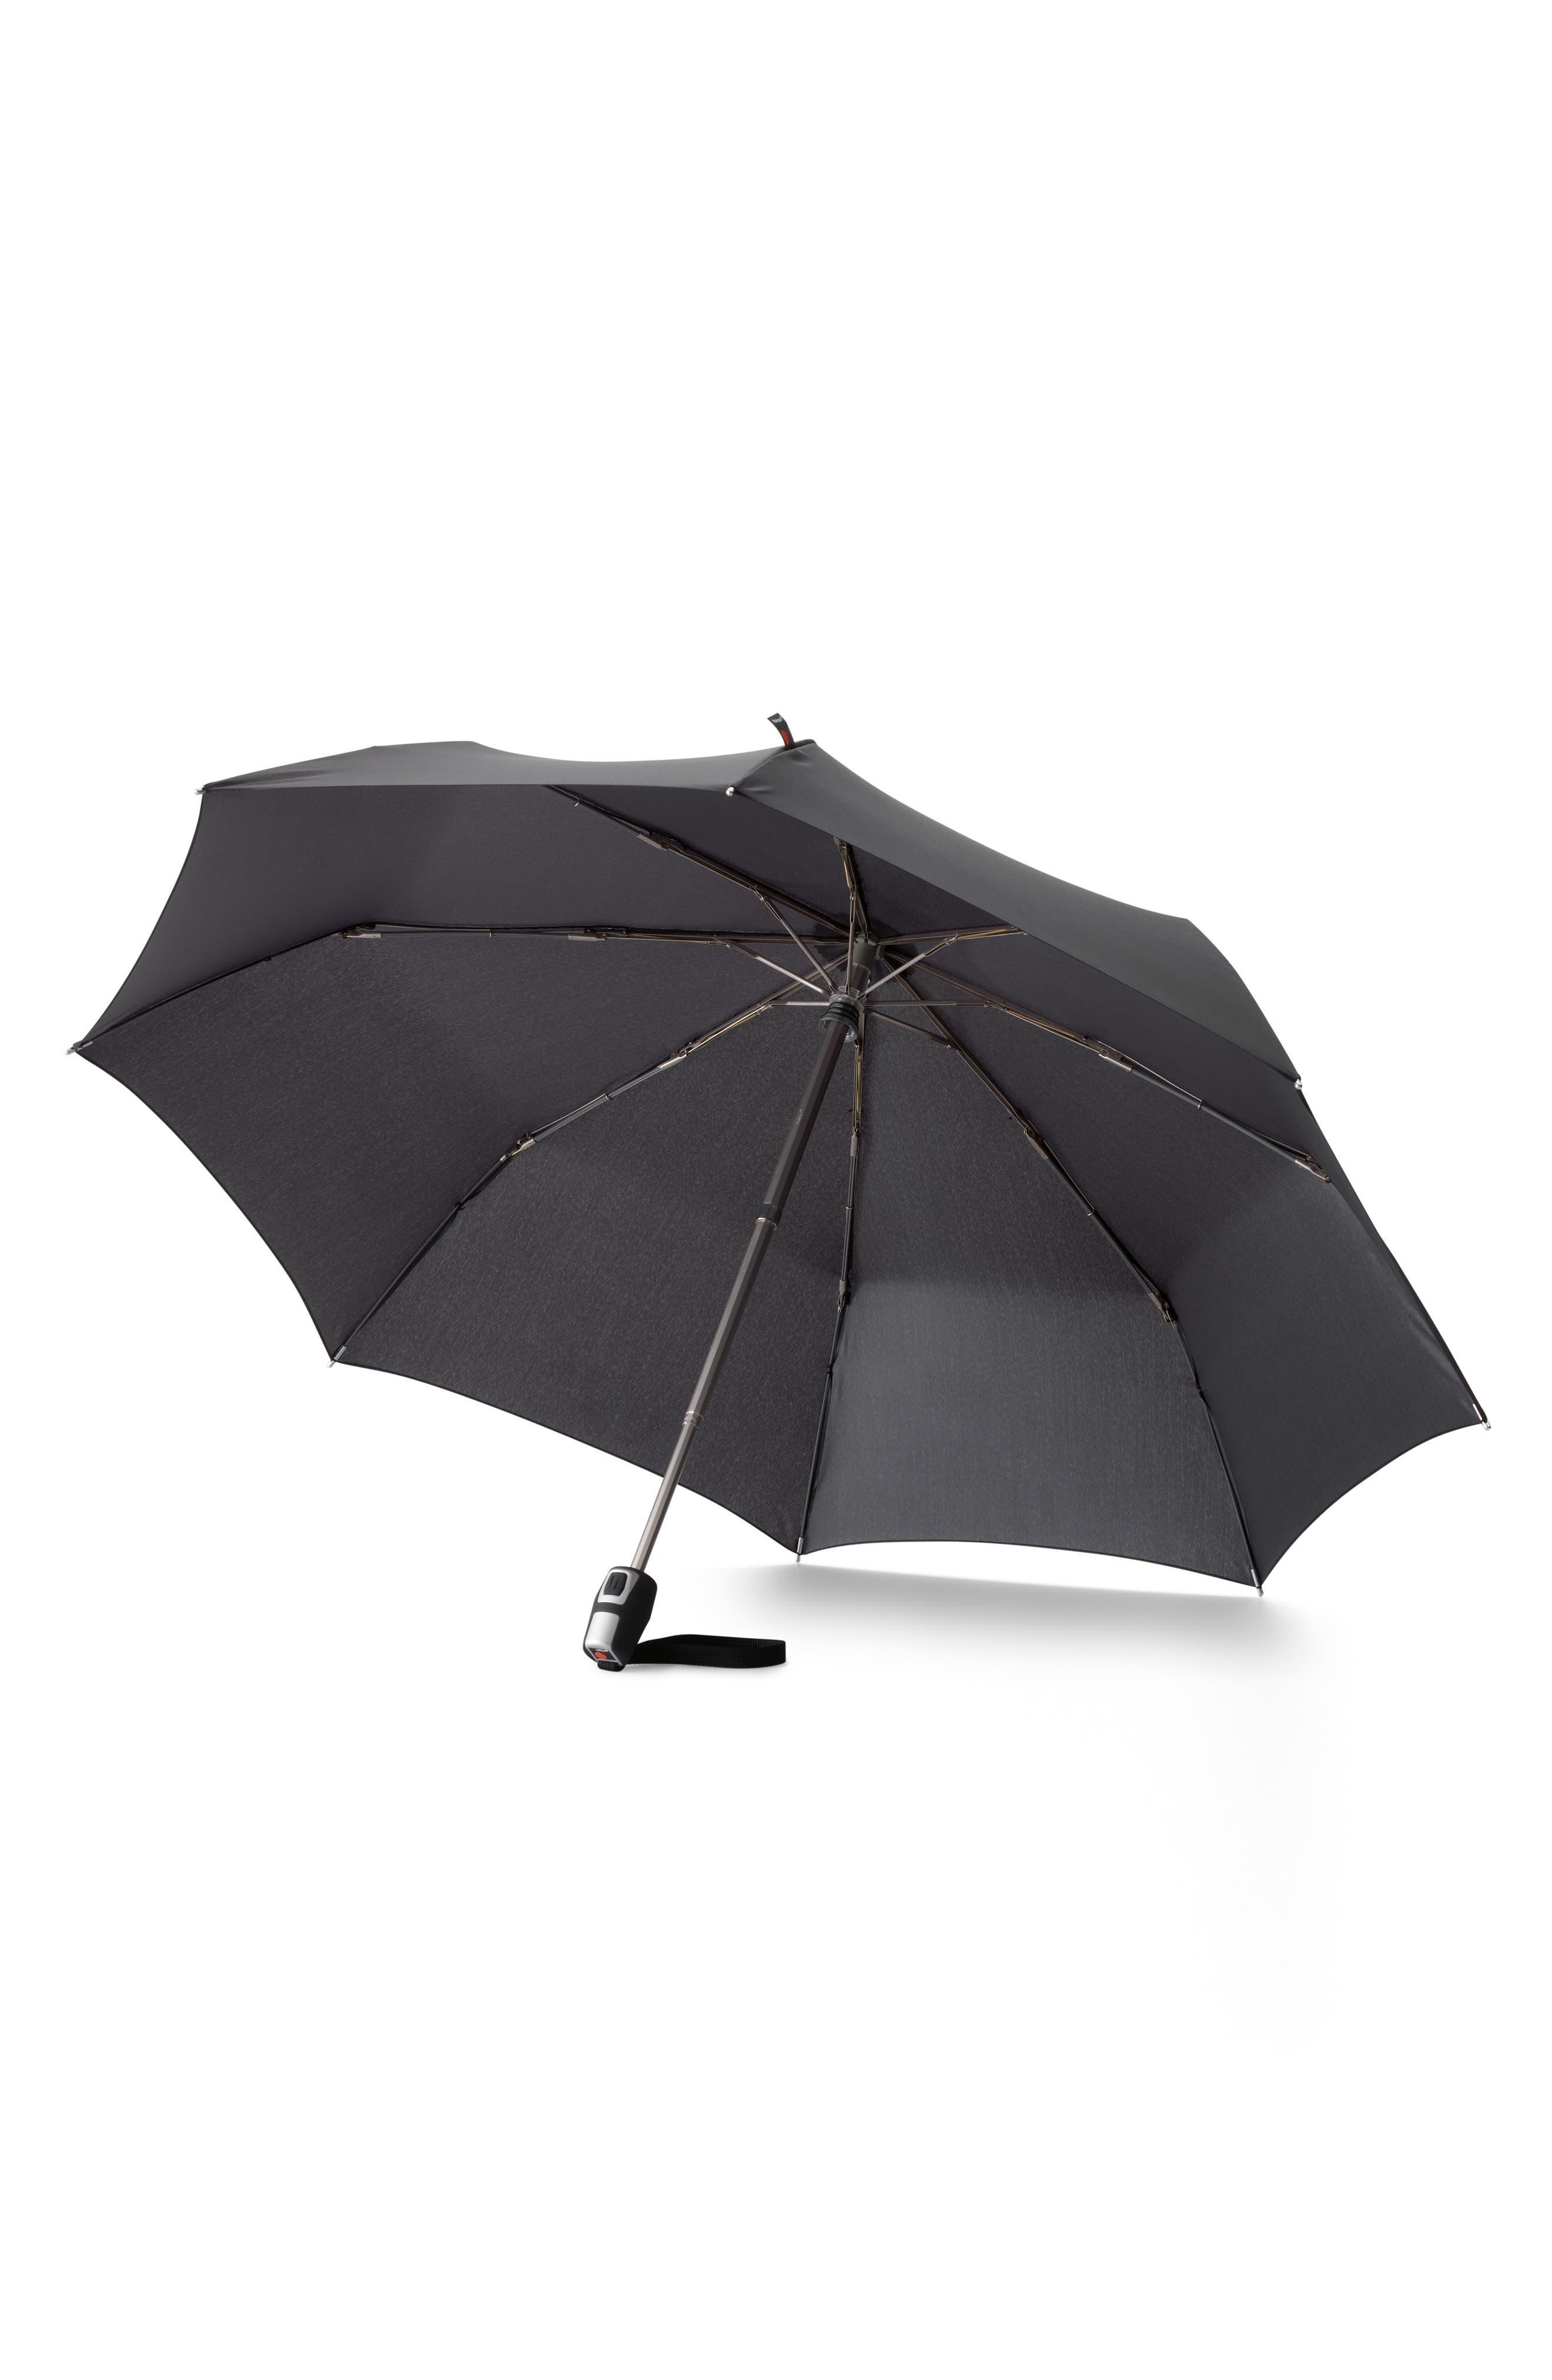 T200 Auto Open/Close Umbrella,                             Alternate thumbnail 2, color,                             Black